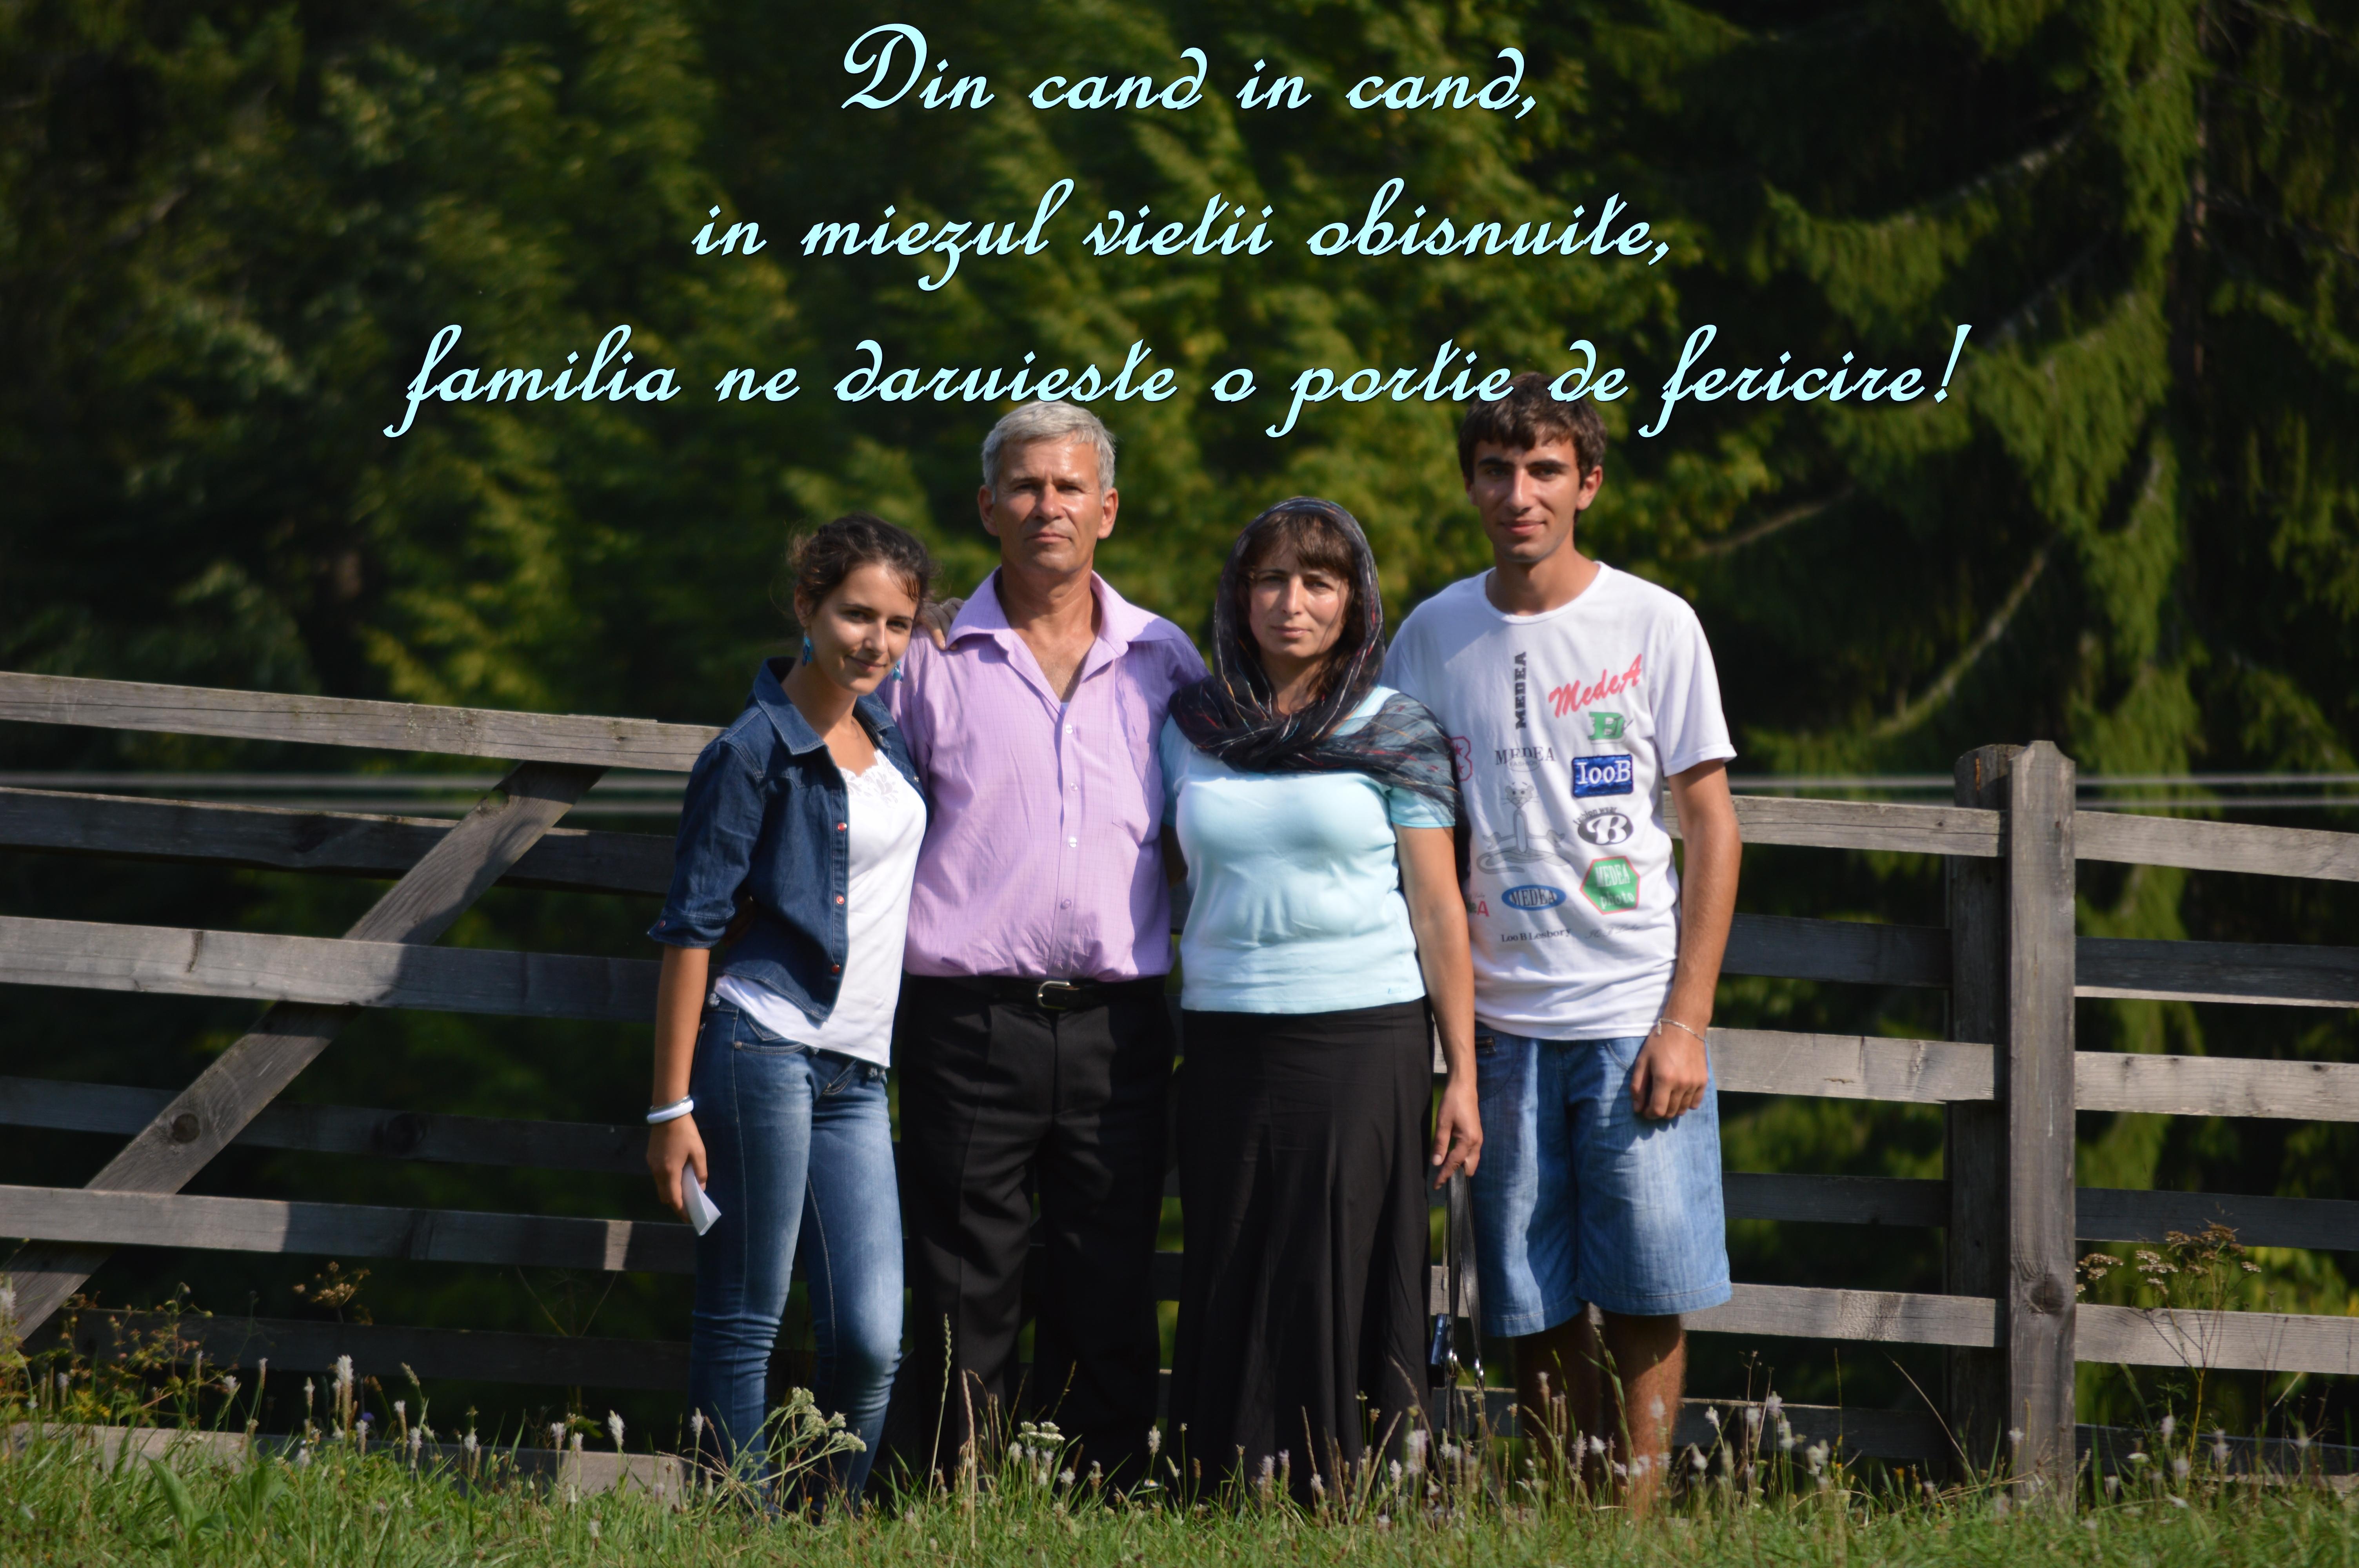 familia o portie de fericire